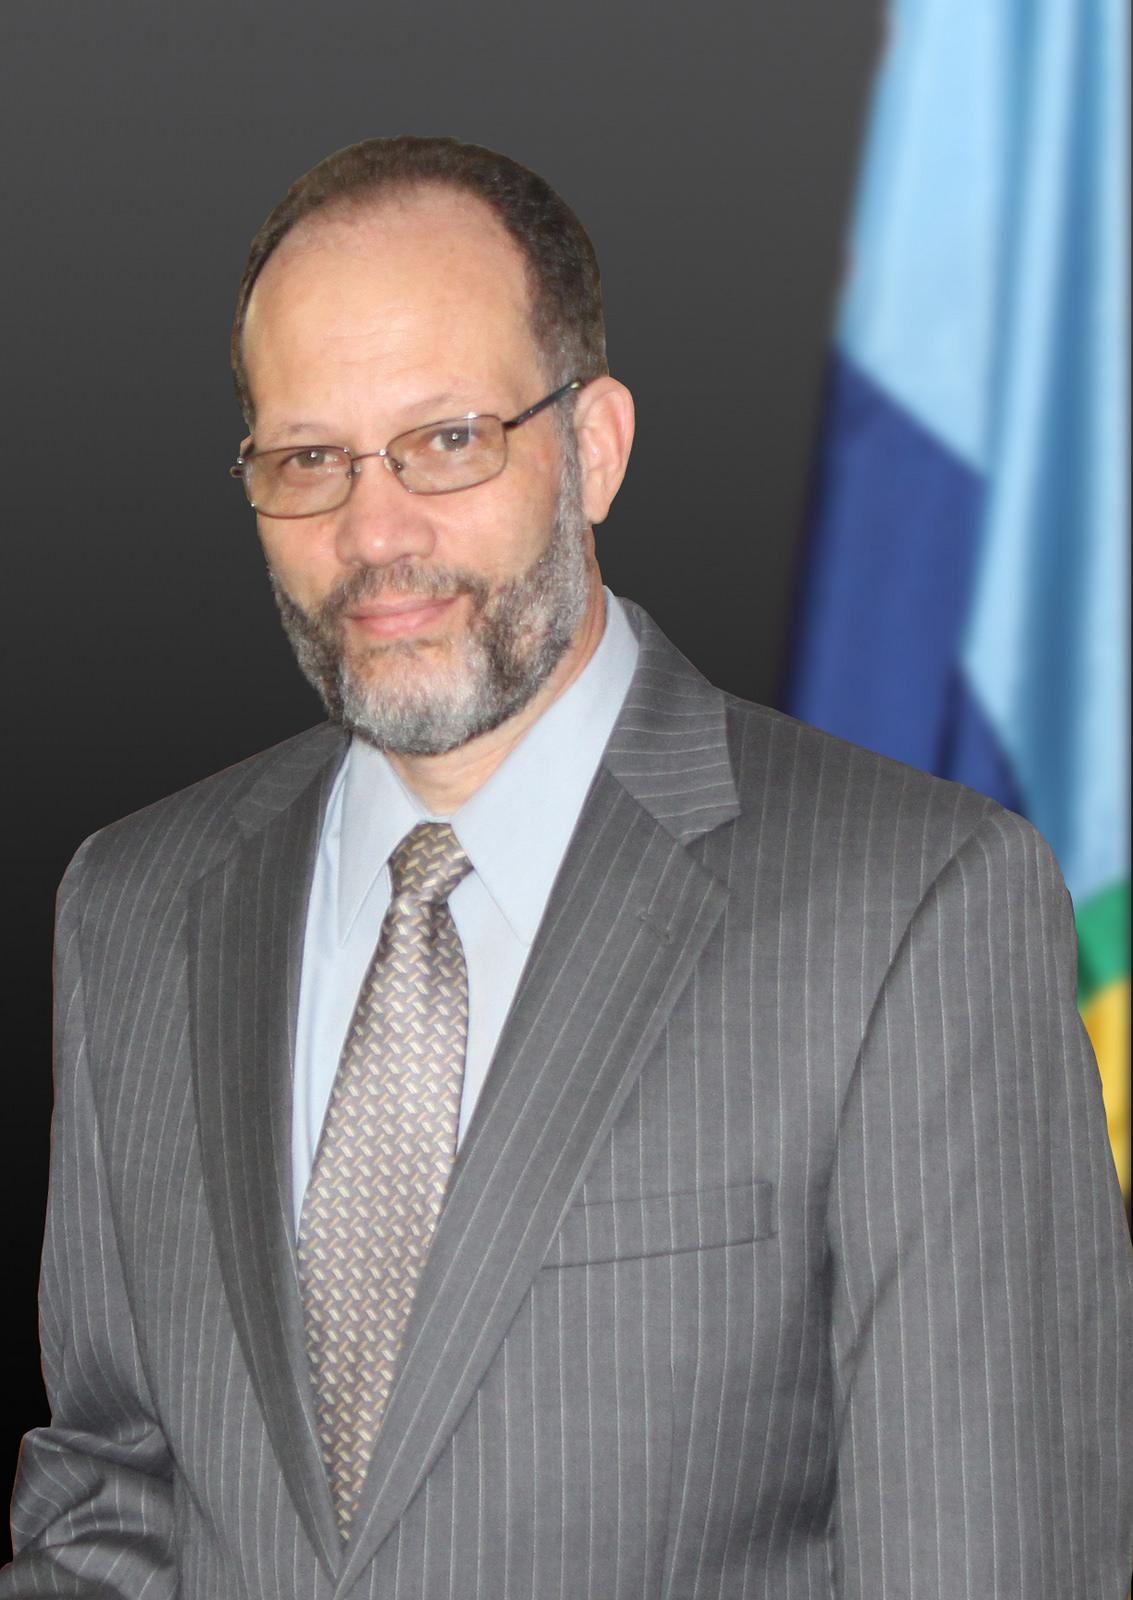 CARICOM Secretary-General